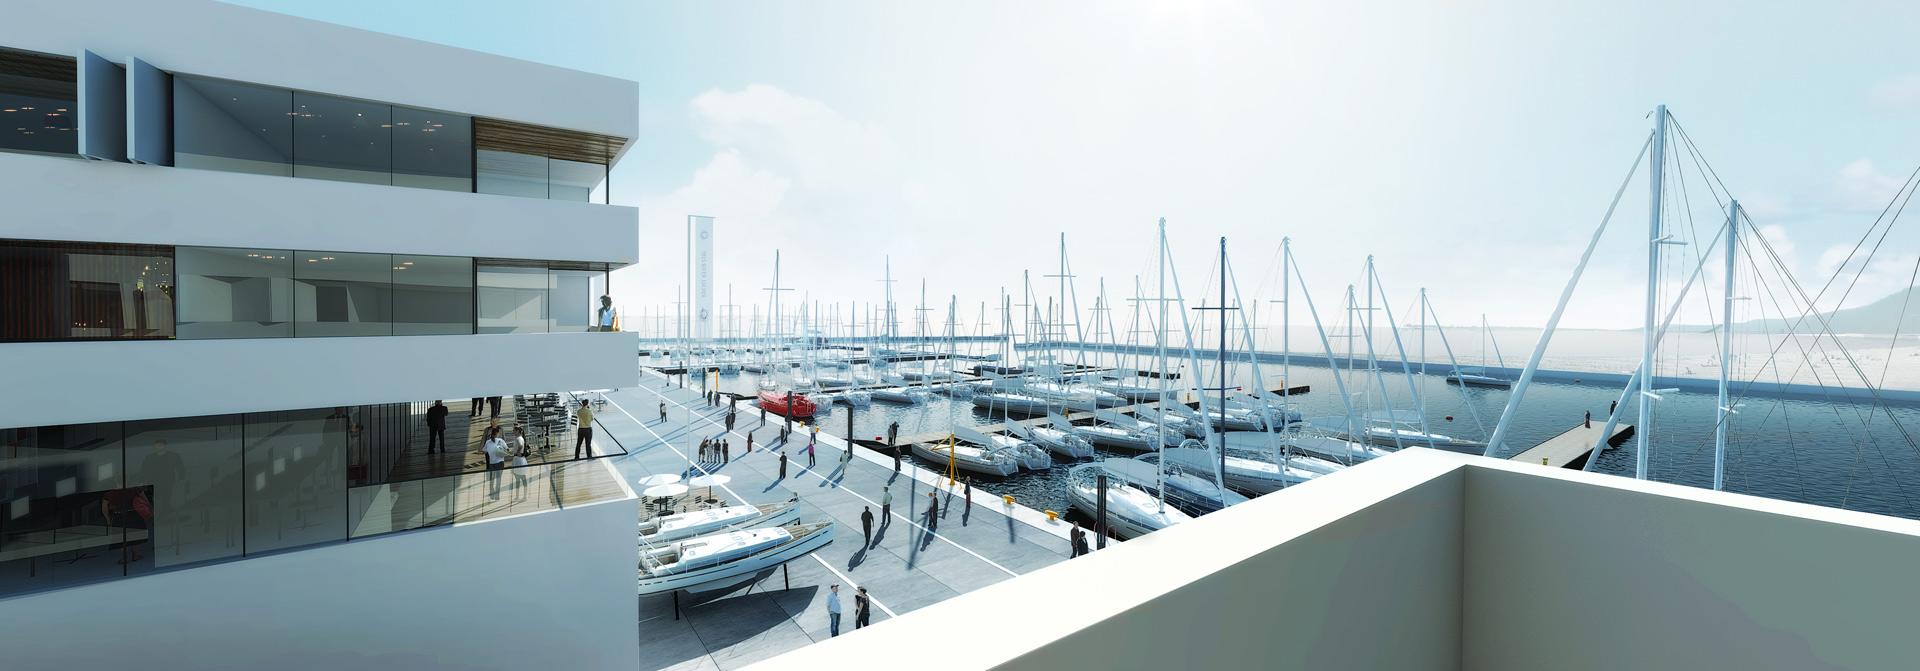 We know the winning design of New Marina